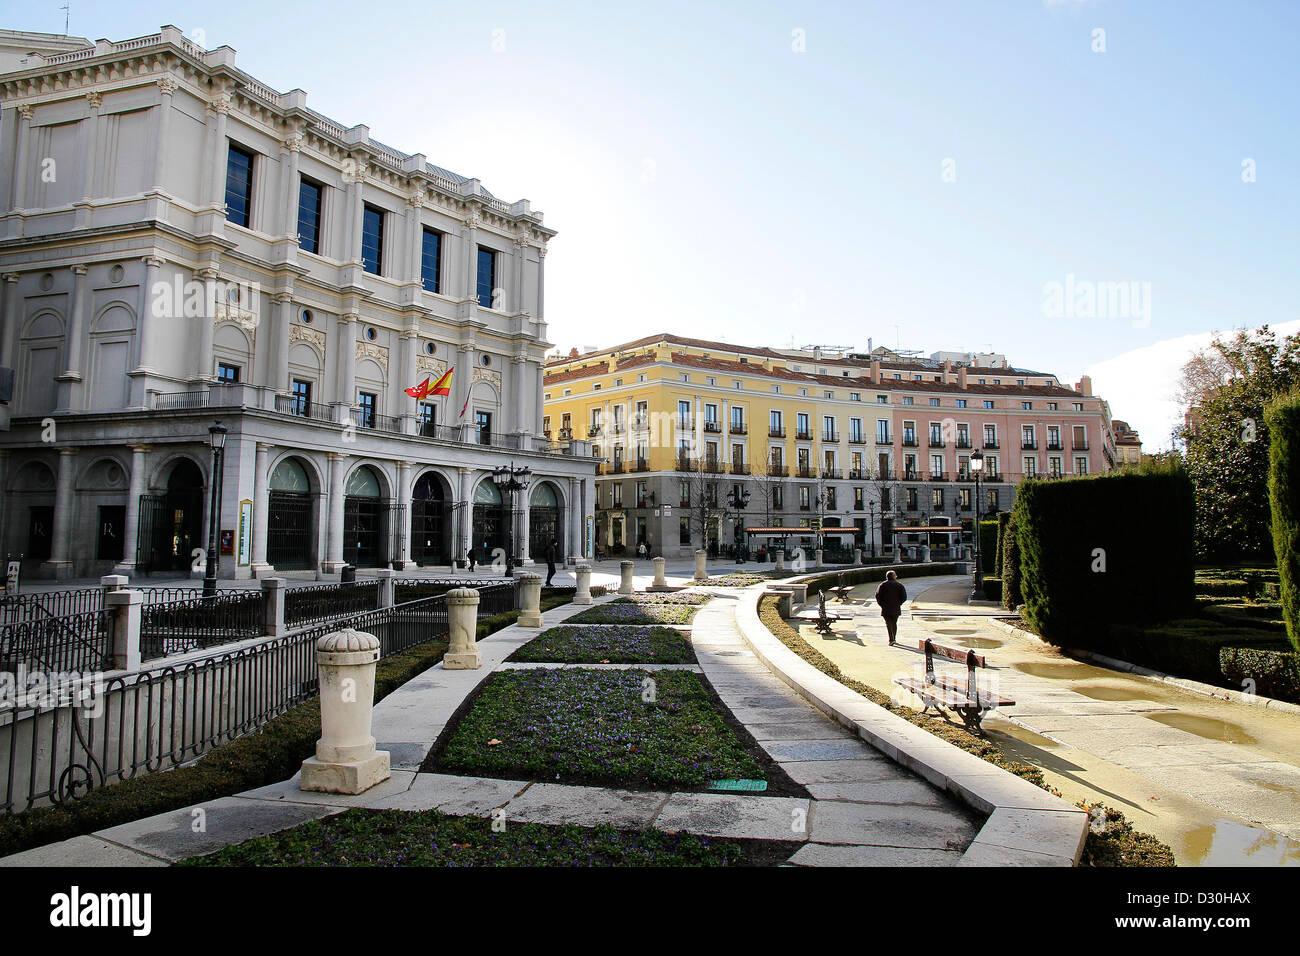 The Plaza de oriente in madrid Spain - Stock Image